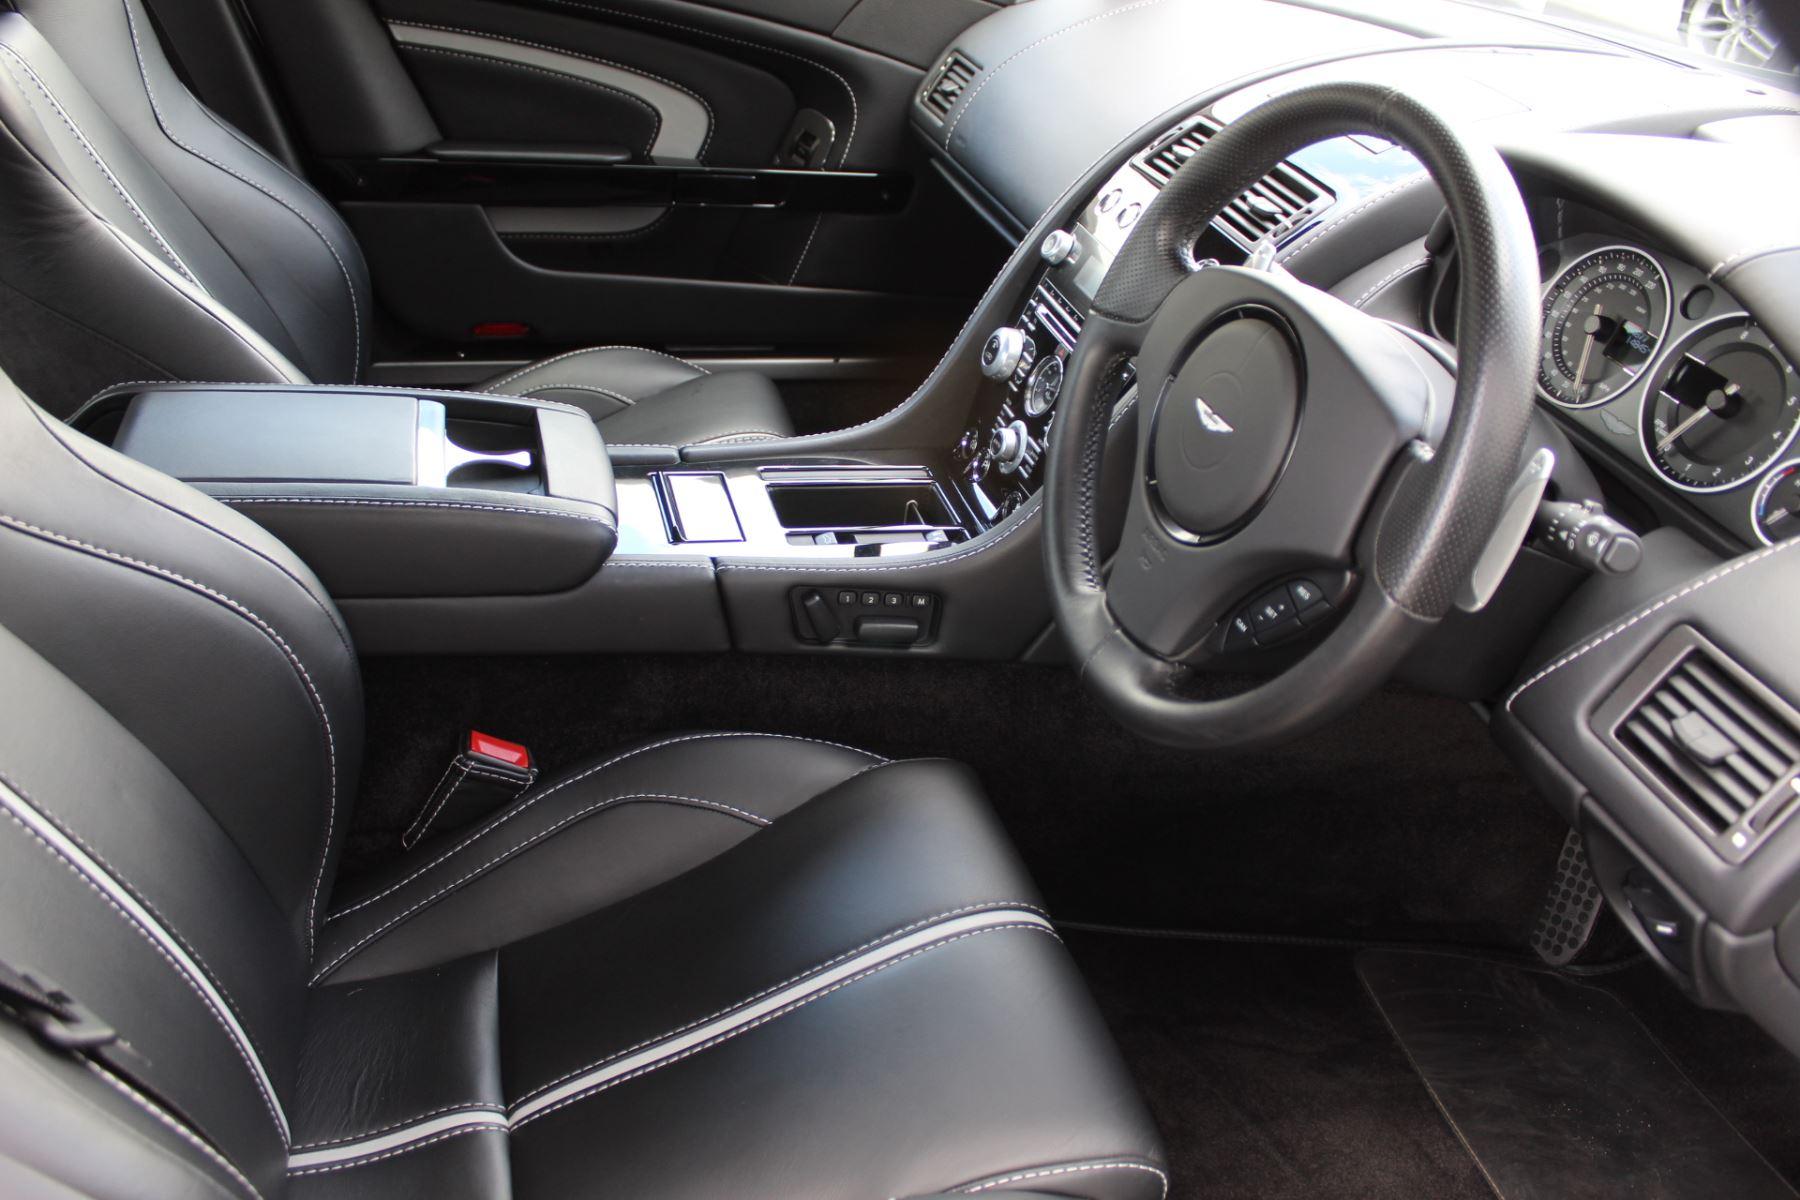 Aston Martin V12 Vantage S Coupe S 2dr Sportshift III image 11